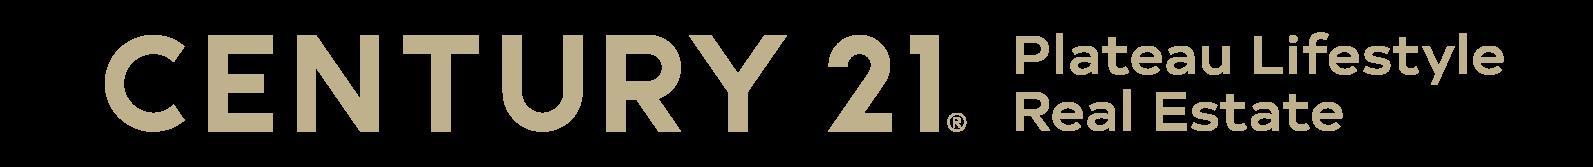 Century 21 Plateau Lifestyle Real Estate, Alstonville, 2477